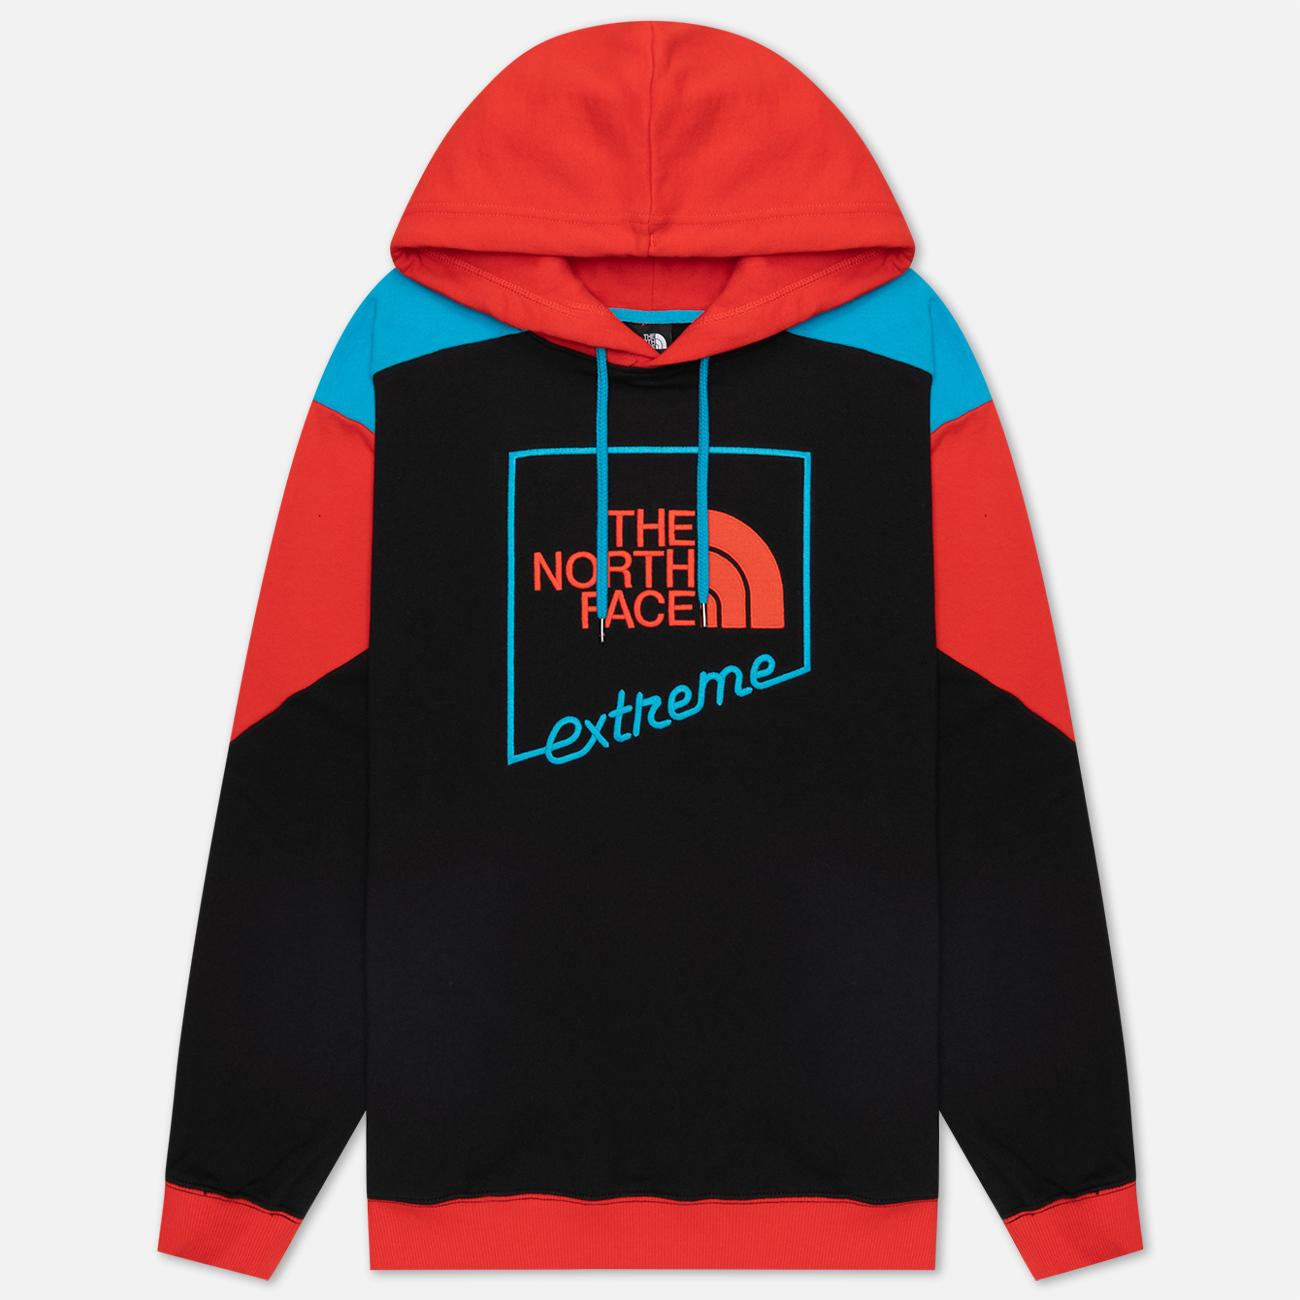 Мужская толстовка The North Face Xtreme Hoodie TNF Black/Fiery Red/Meridian Blue